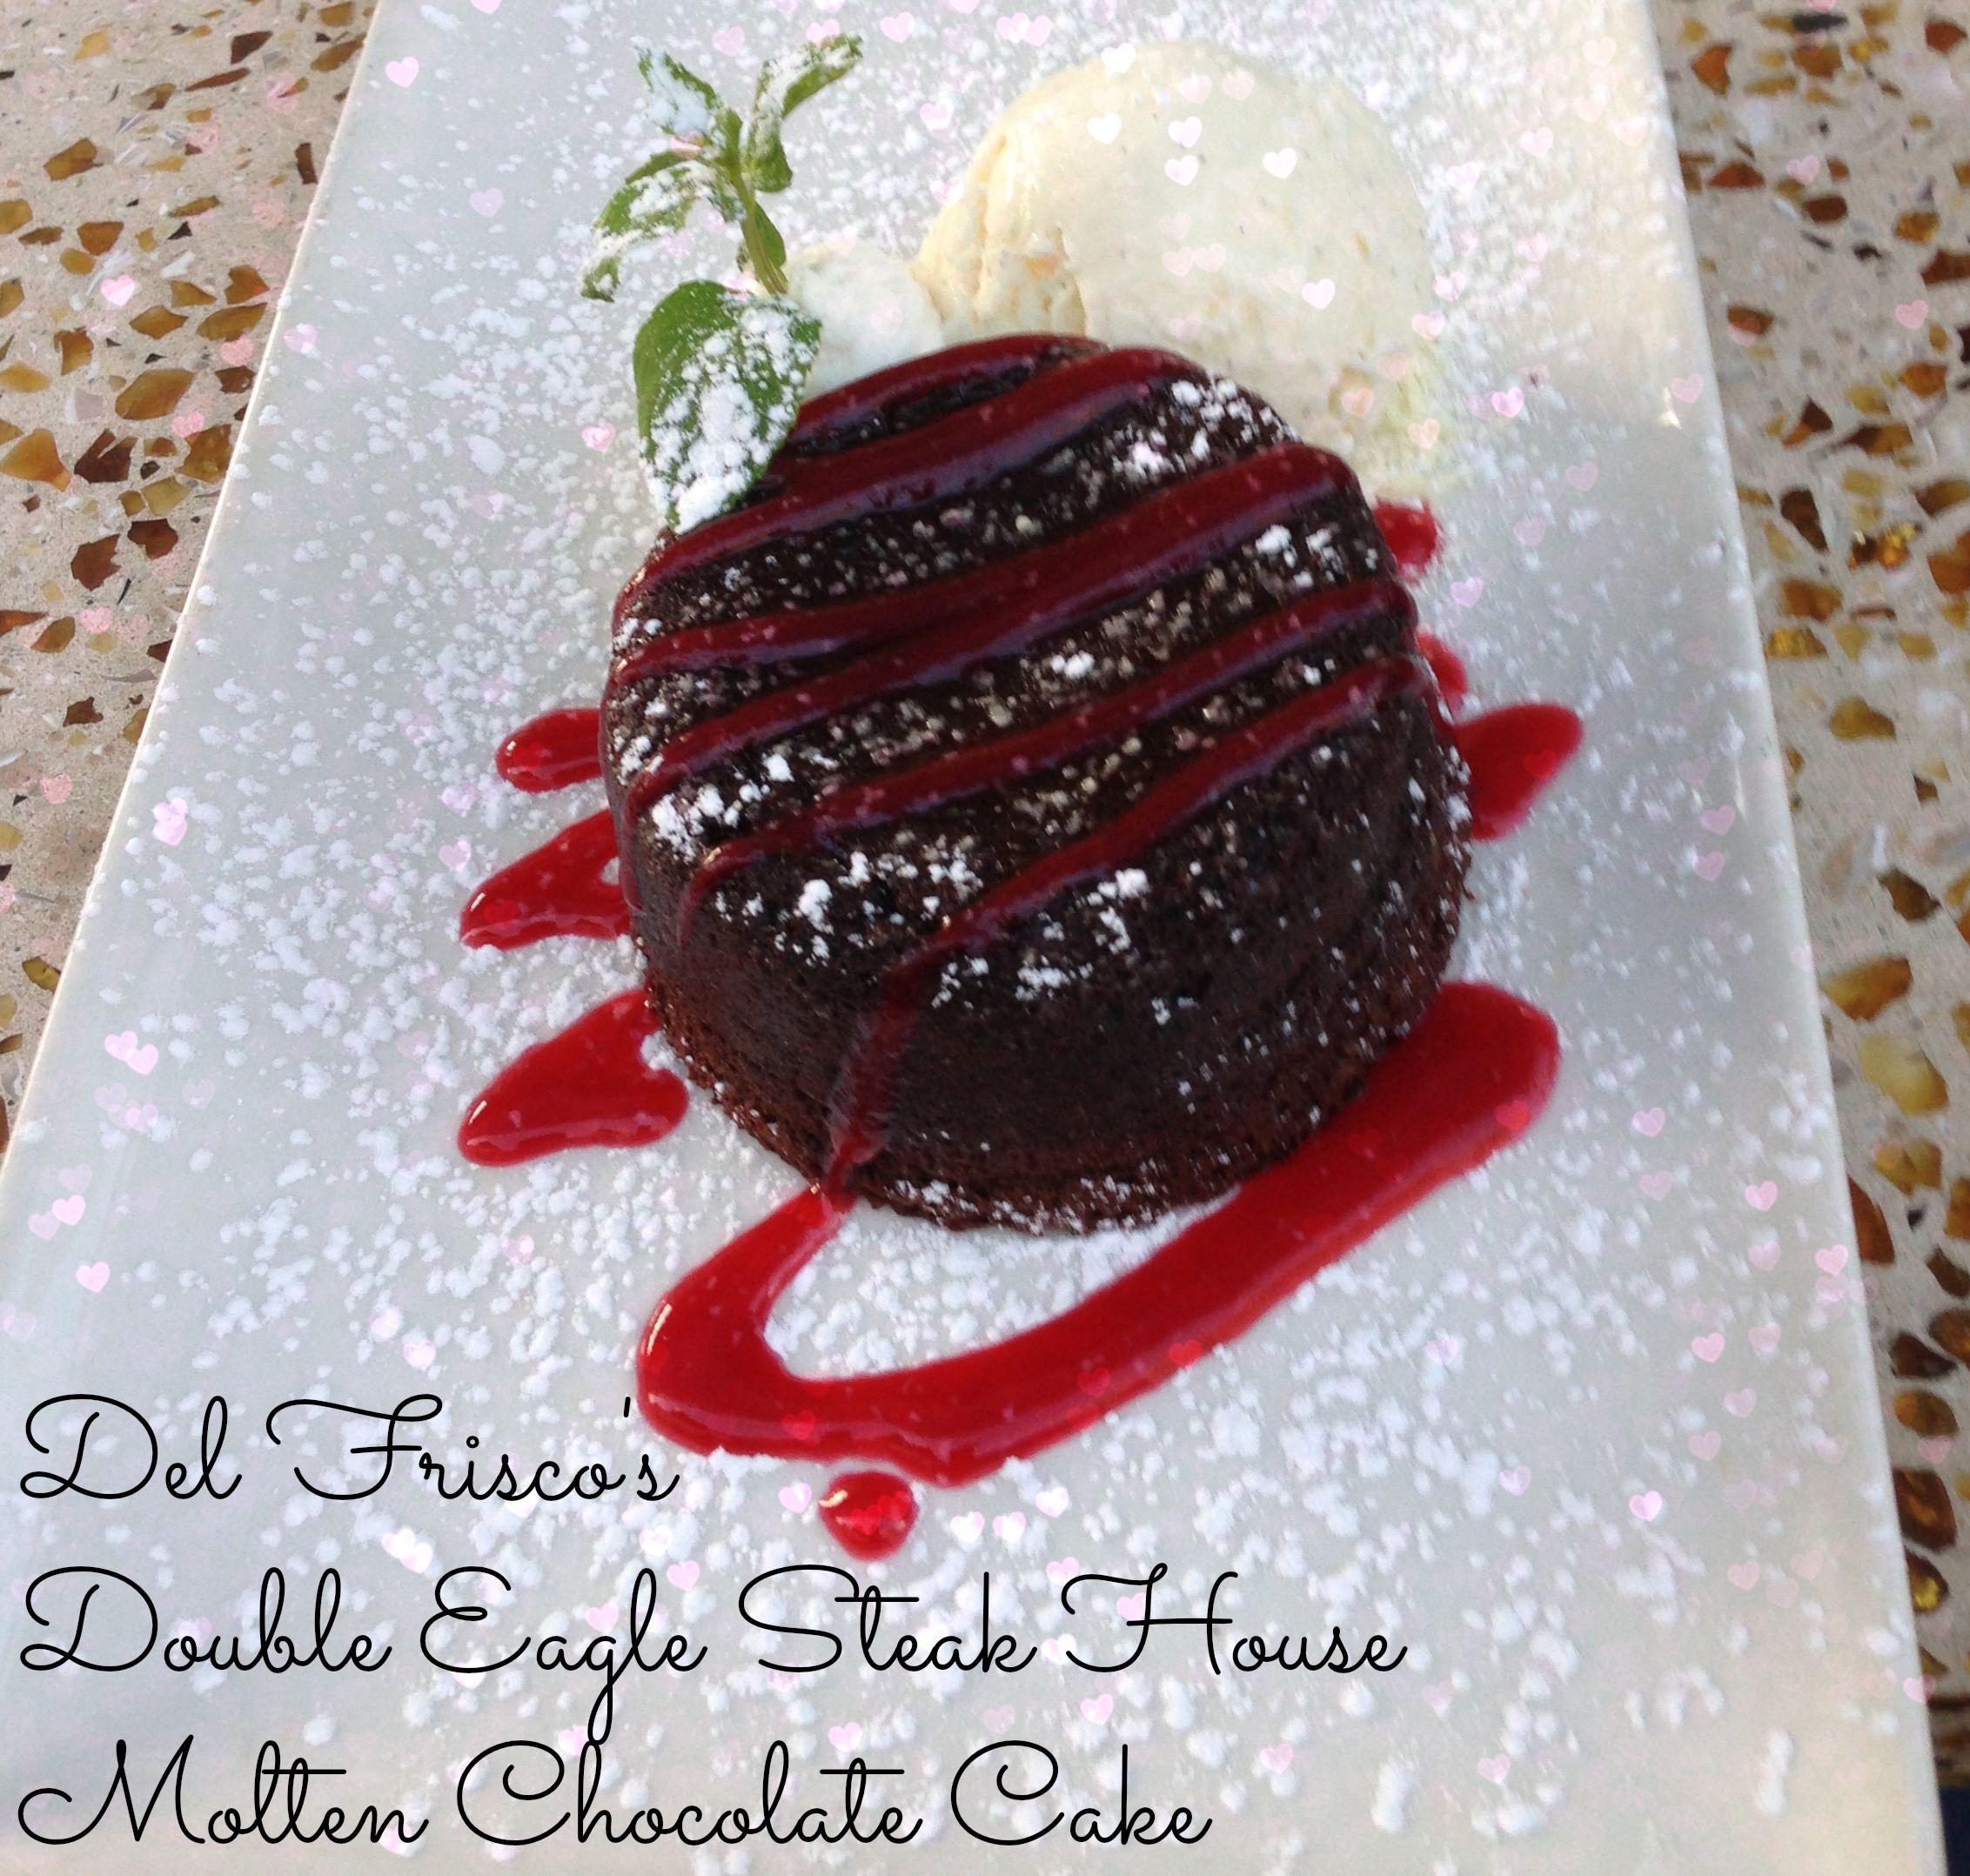 Del friscos double eagle steak house chocolate molten